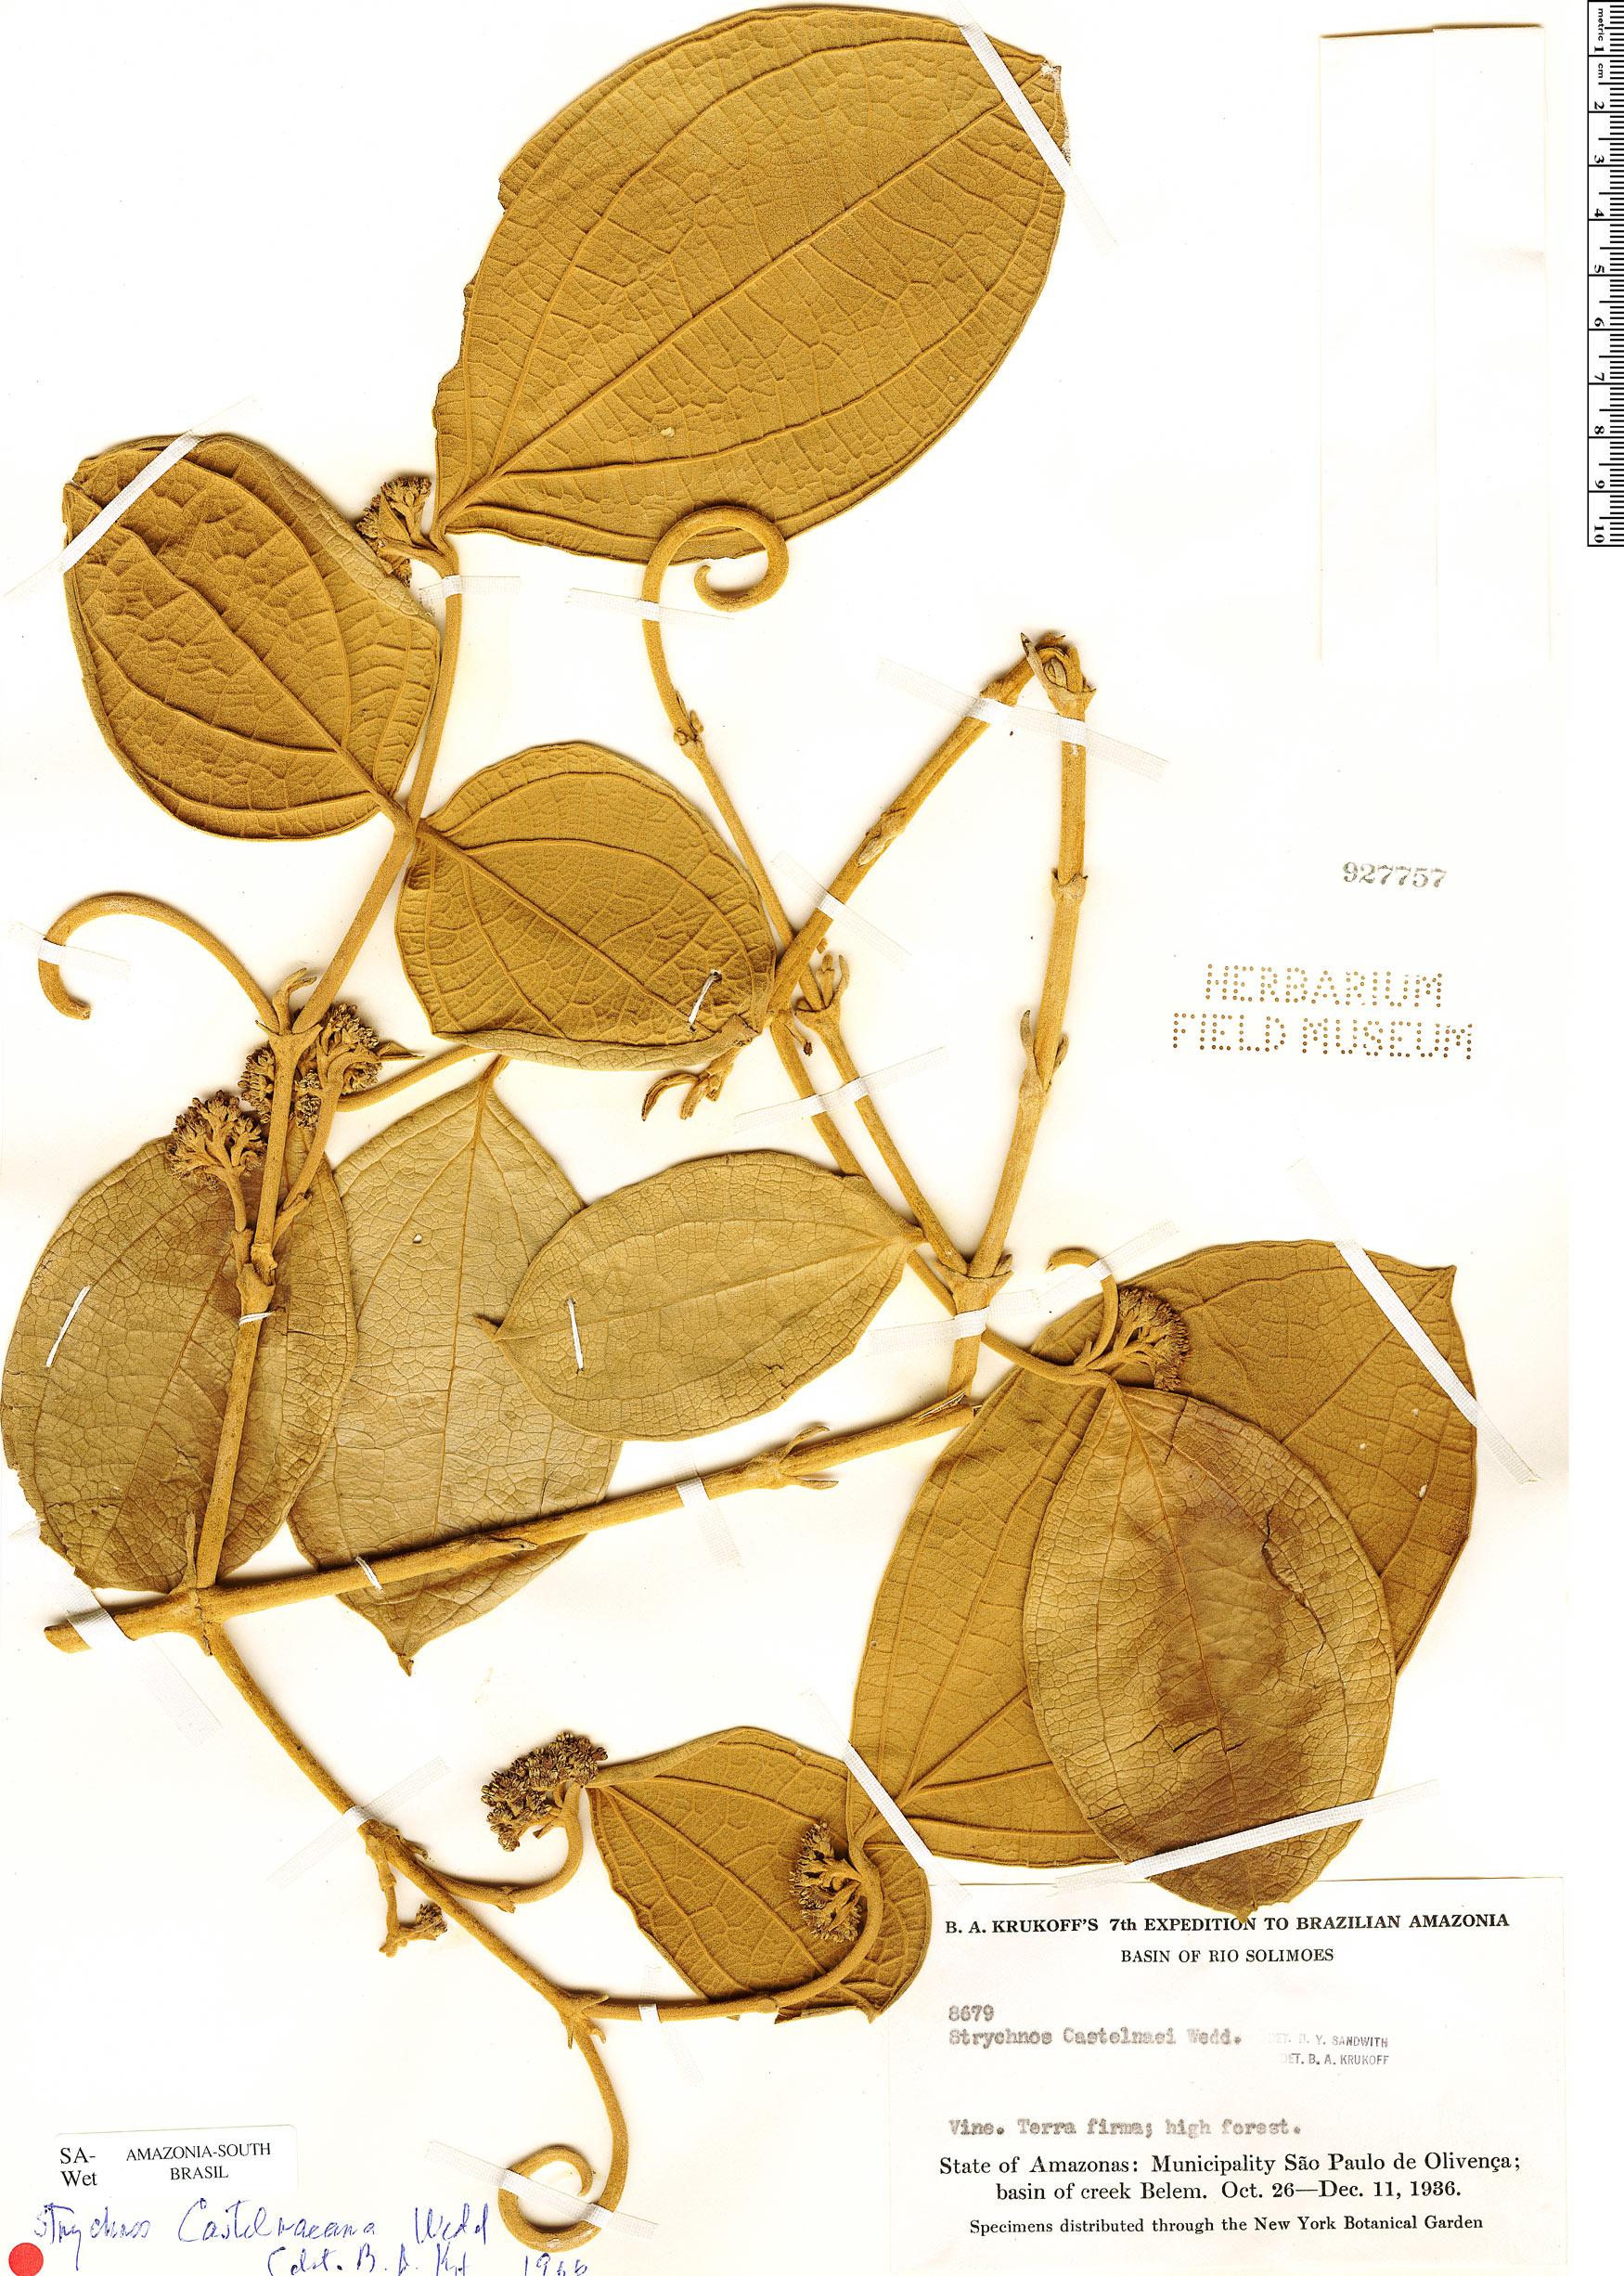 Specimen: Strychnos castelnaeana